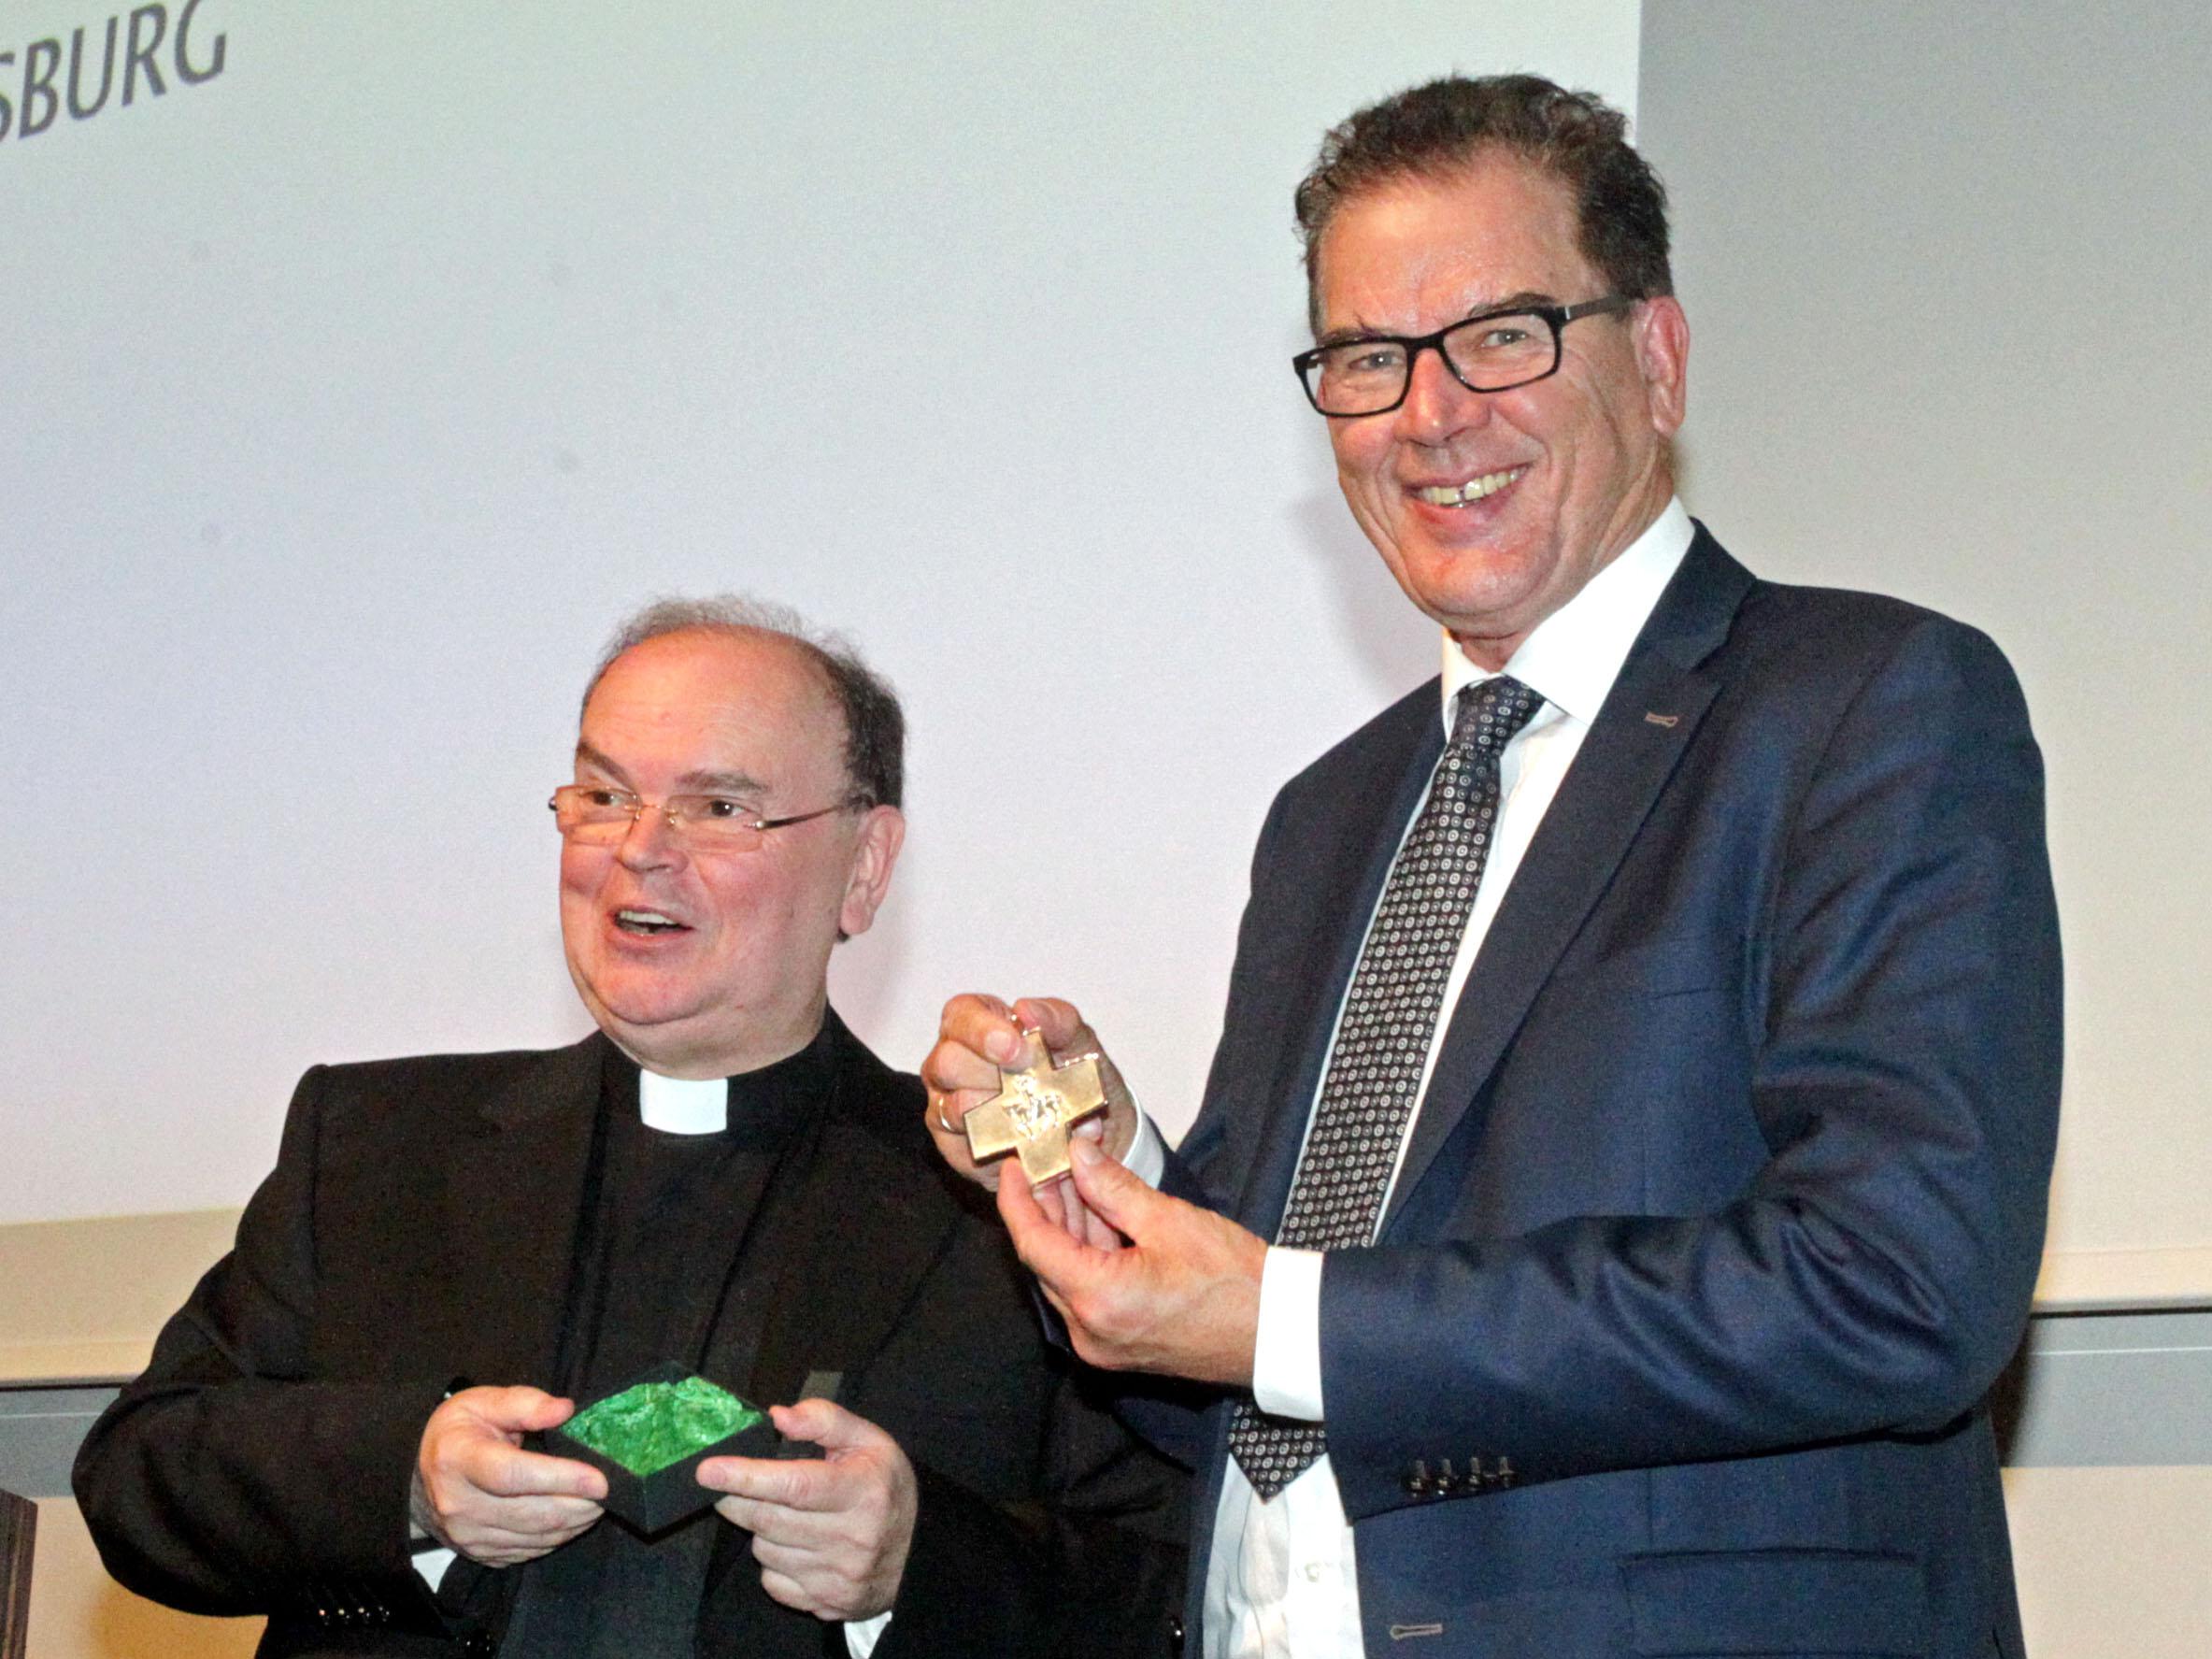 Diözesanadministrator Bertram Meier überreicht Minister Müller das Ulrichskreuz.